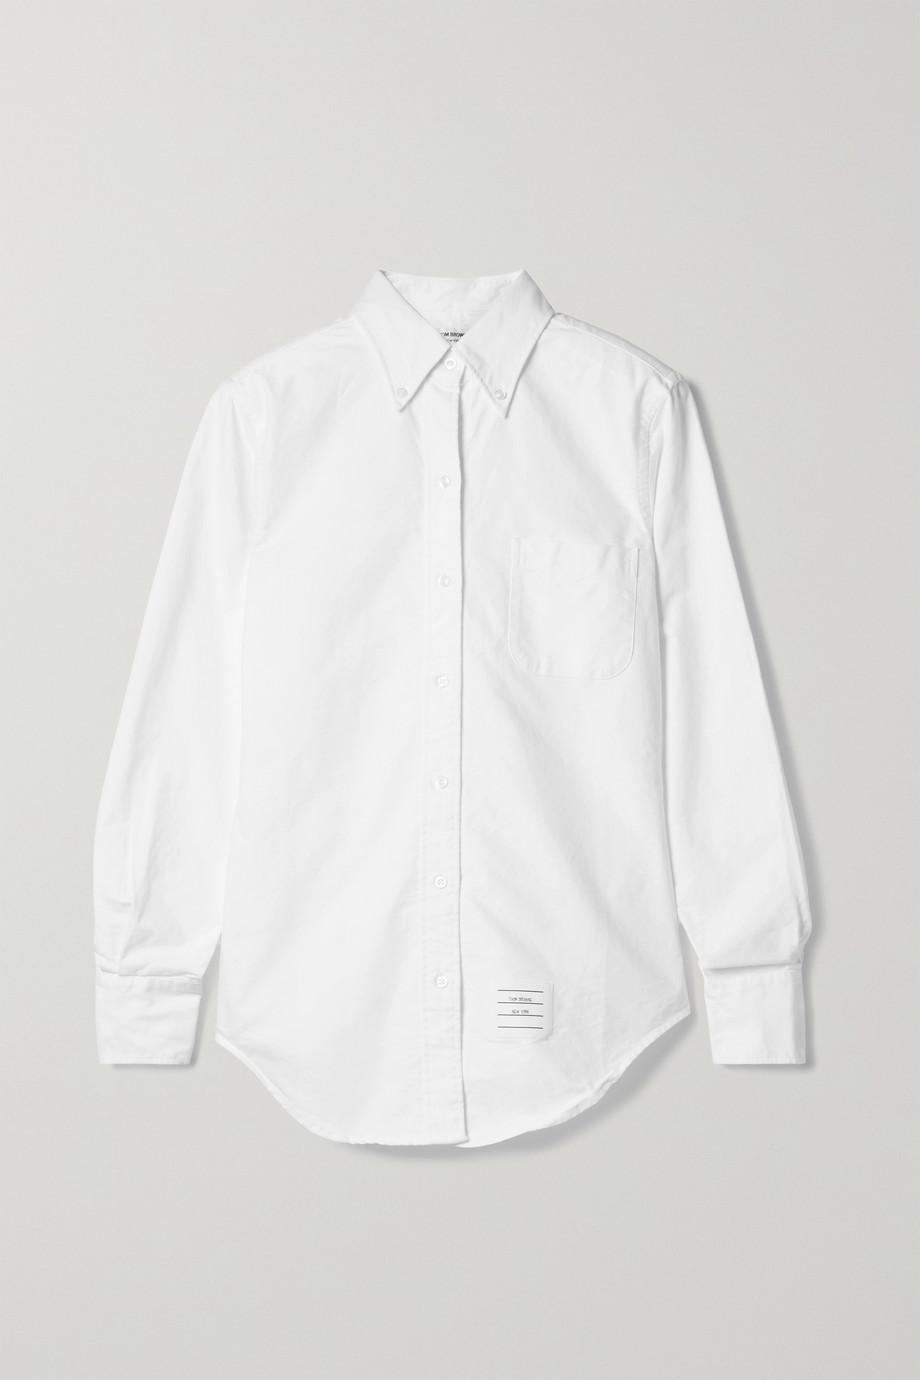 Thom Browne 纯棉牛津纺衬衫